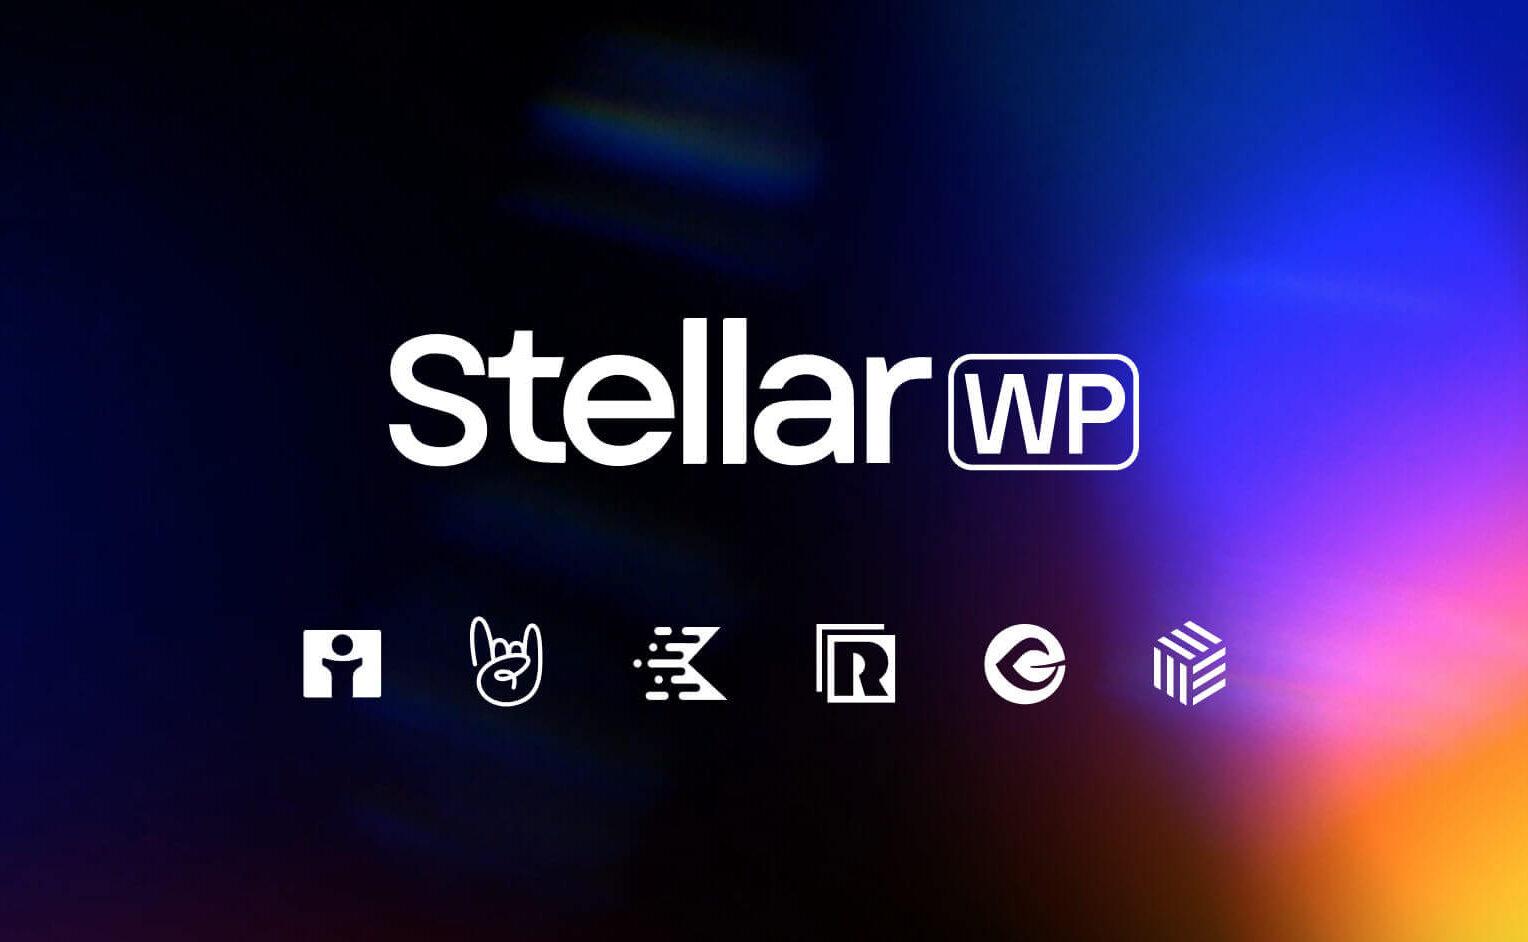 The StellarWP logo on a black background with blue and orange gradients. Undeneath are StellarWP brand logos